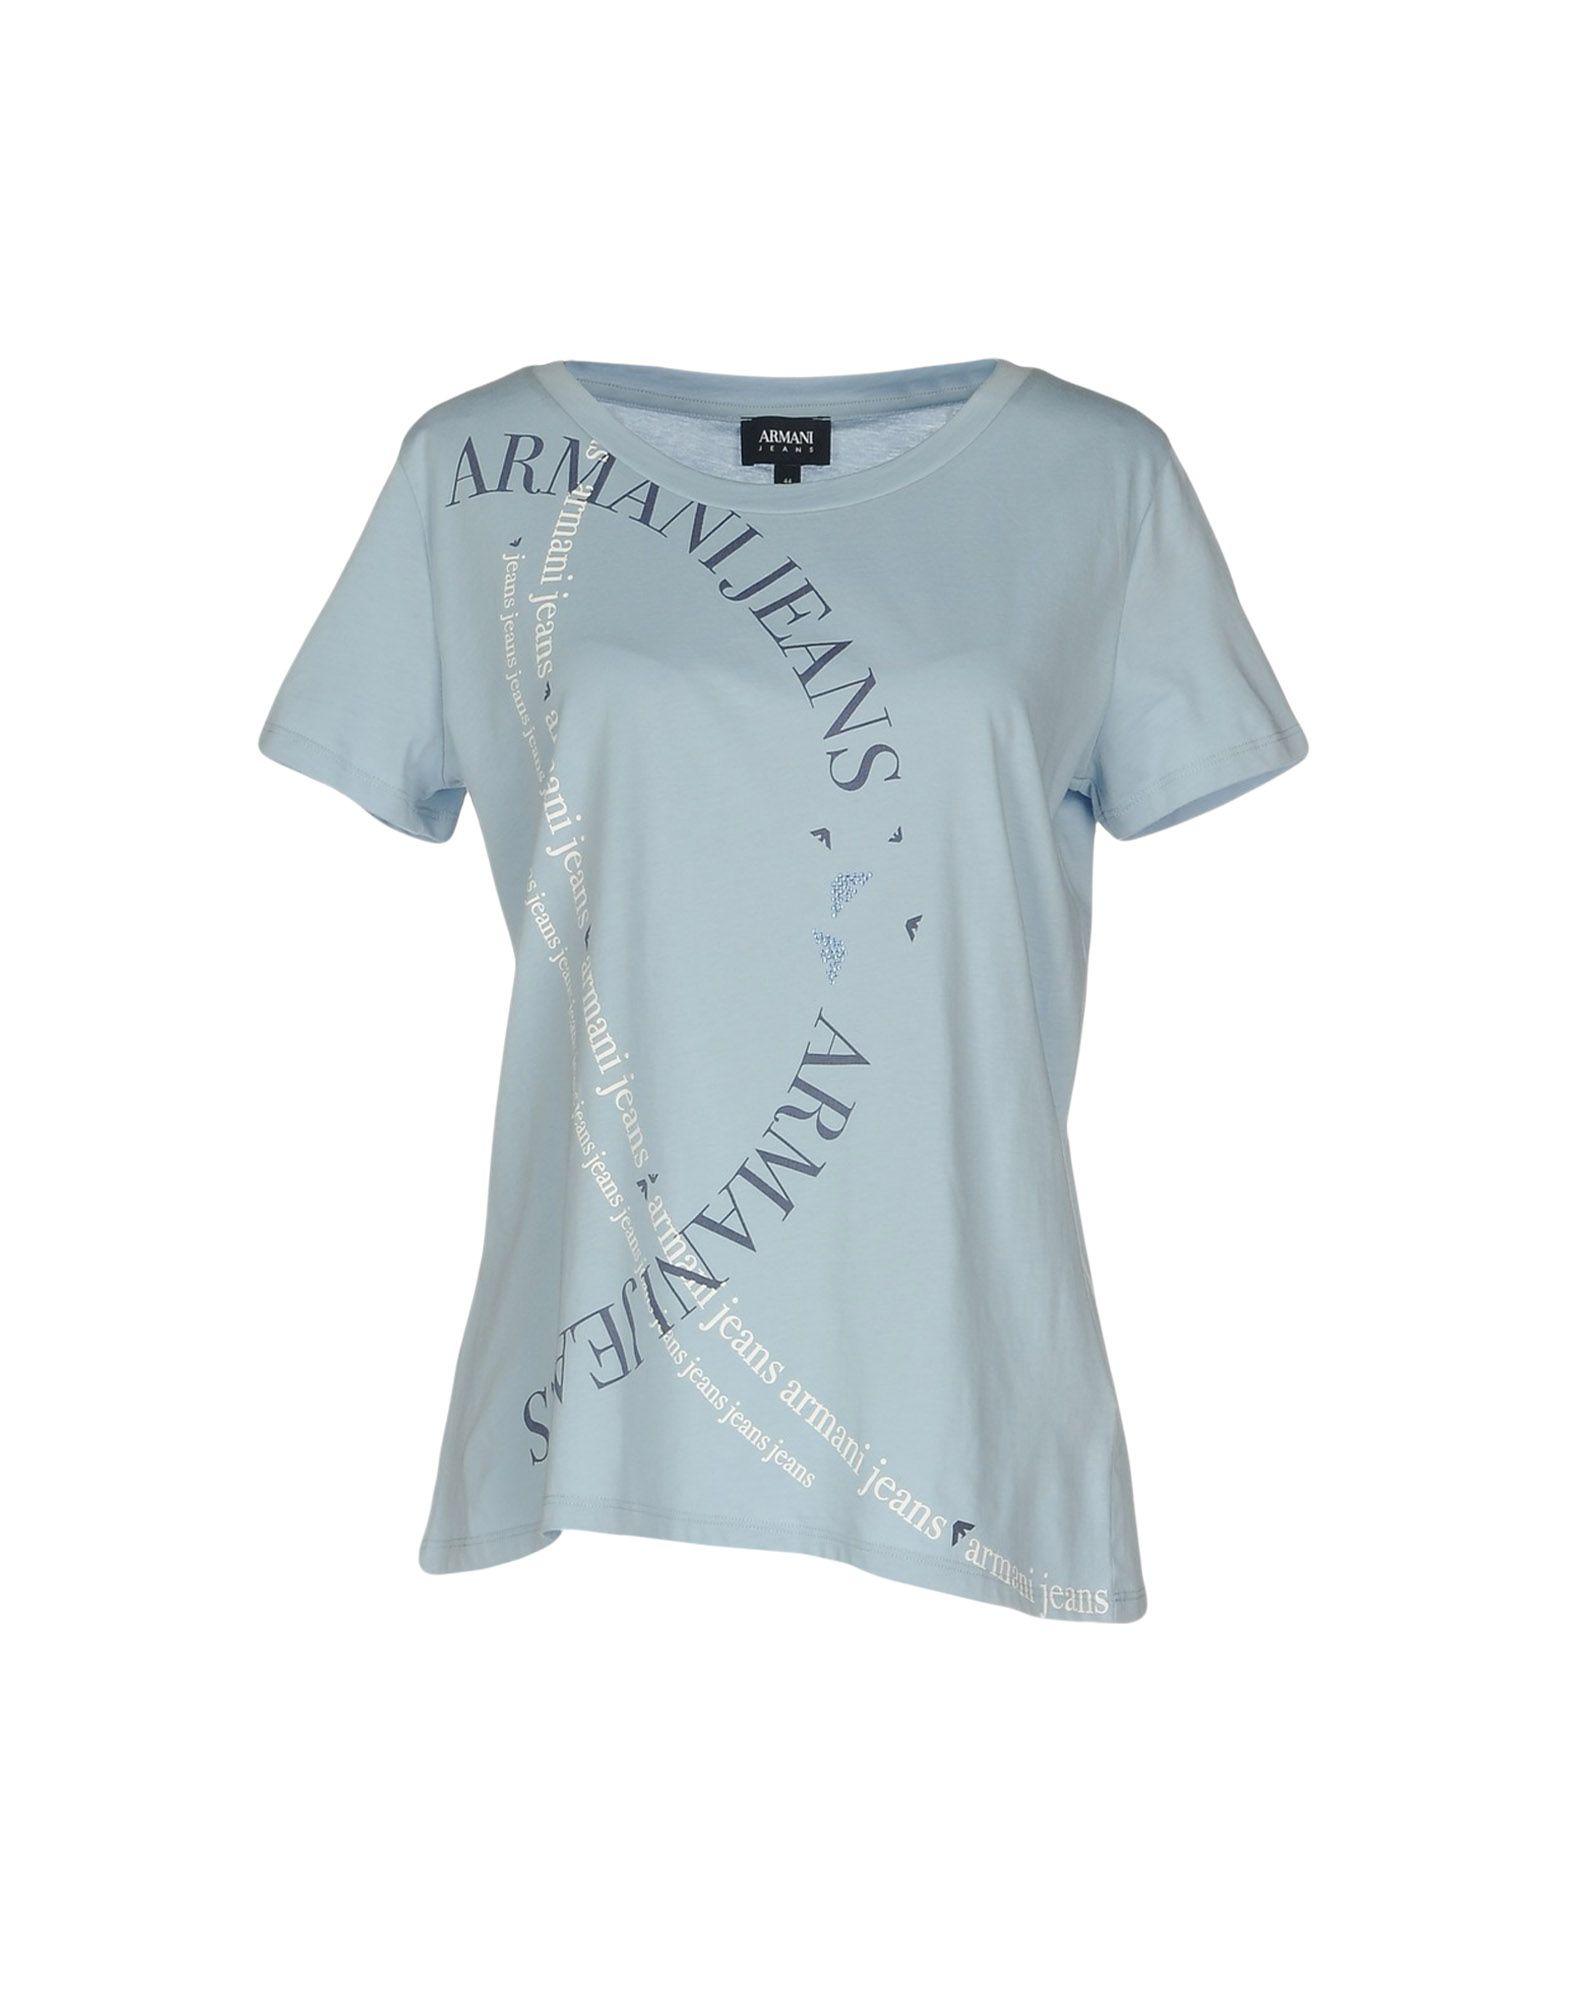 ARMANI JEANS Футболка футболка armani jeans armani jeans ar411ewrwe27